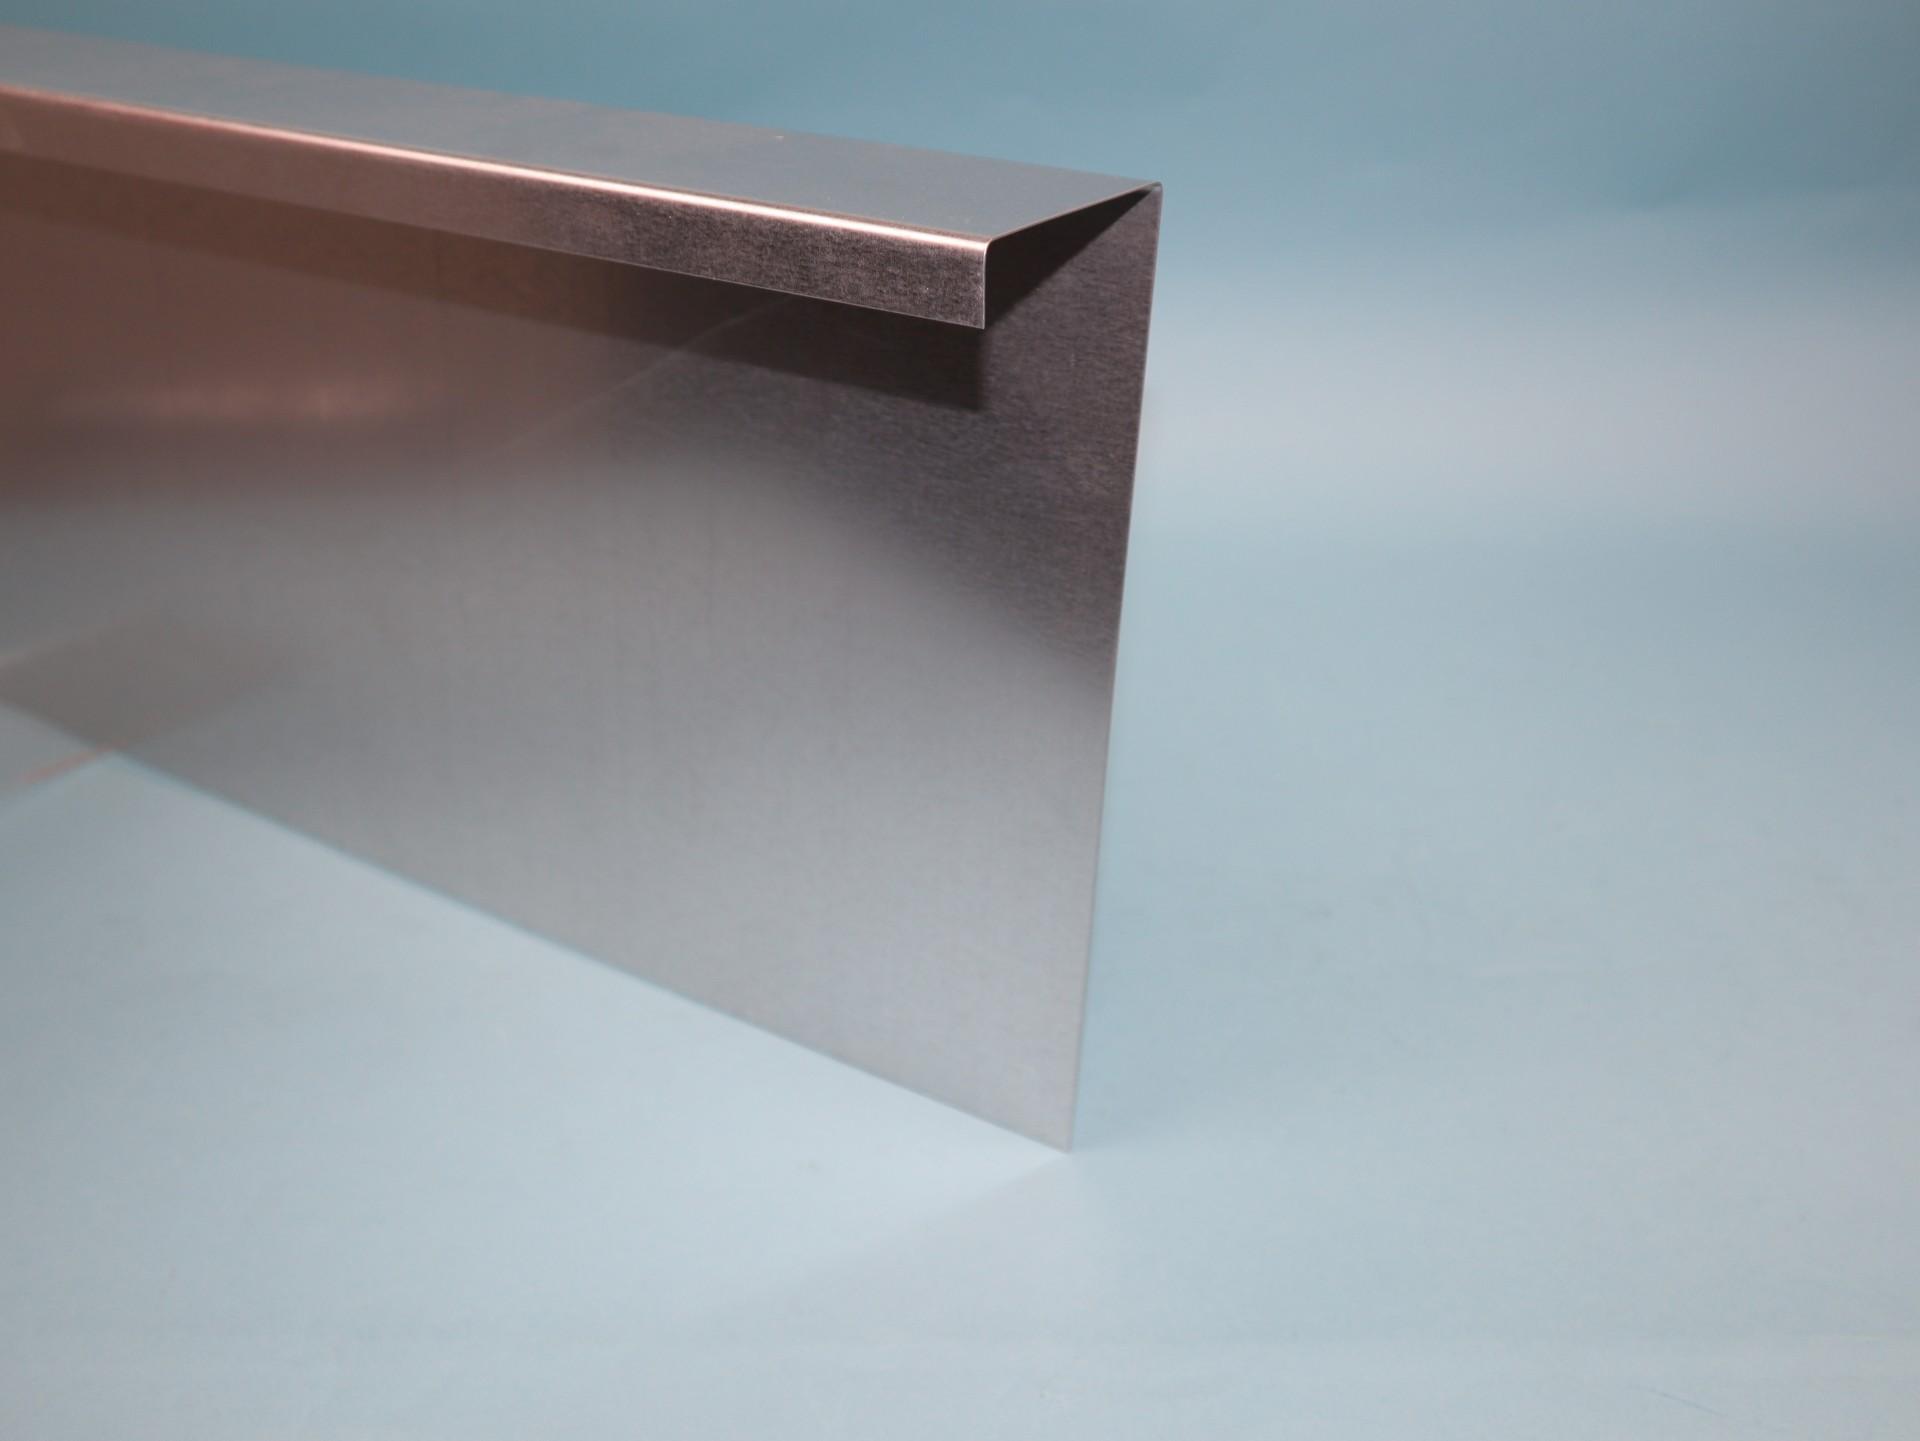 Schneckenzaun aus verzinktem Stahlblech 2m Stück